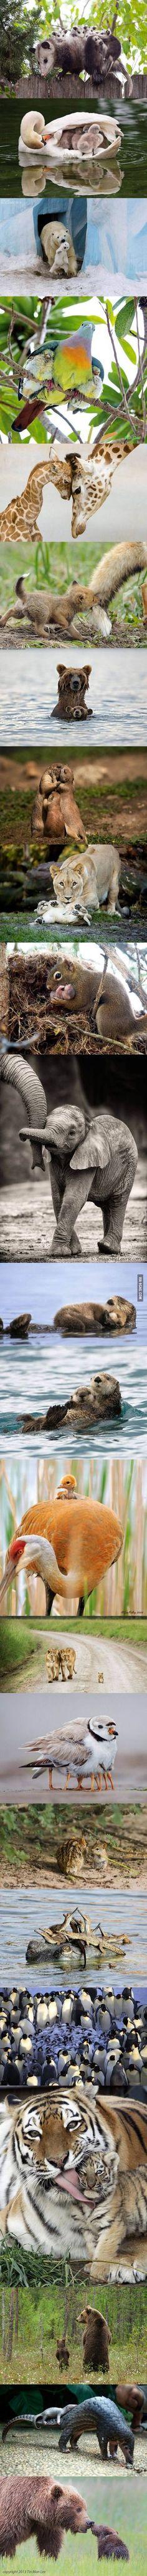 Animal parenthood = cuteness overload